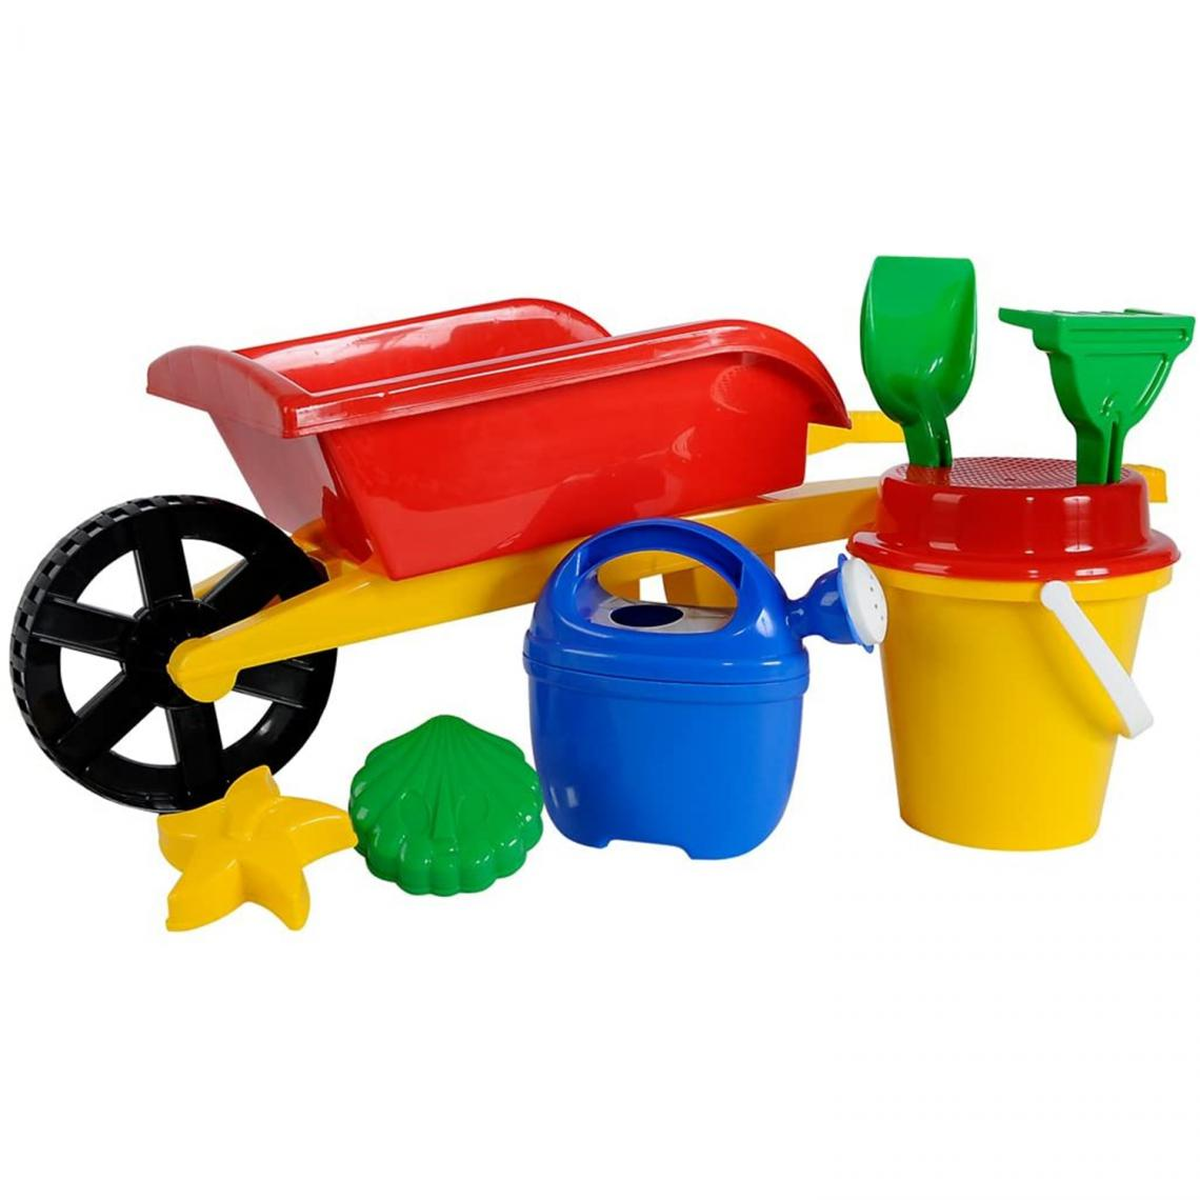 Simba Toys Simba Toys 107136235 - Brouette garnie en plastique 70cm